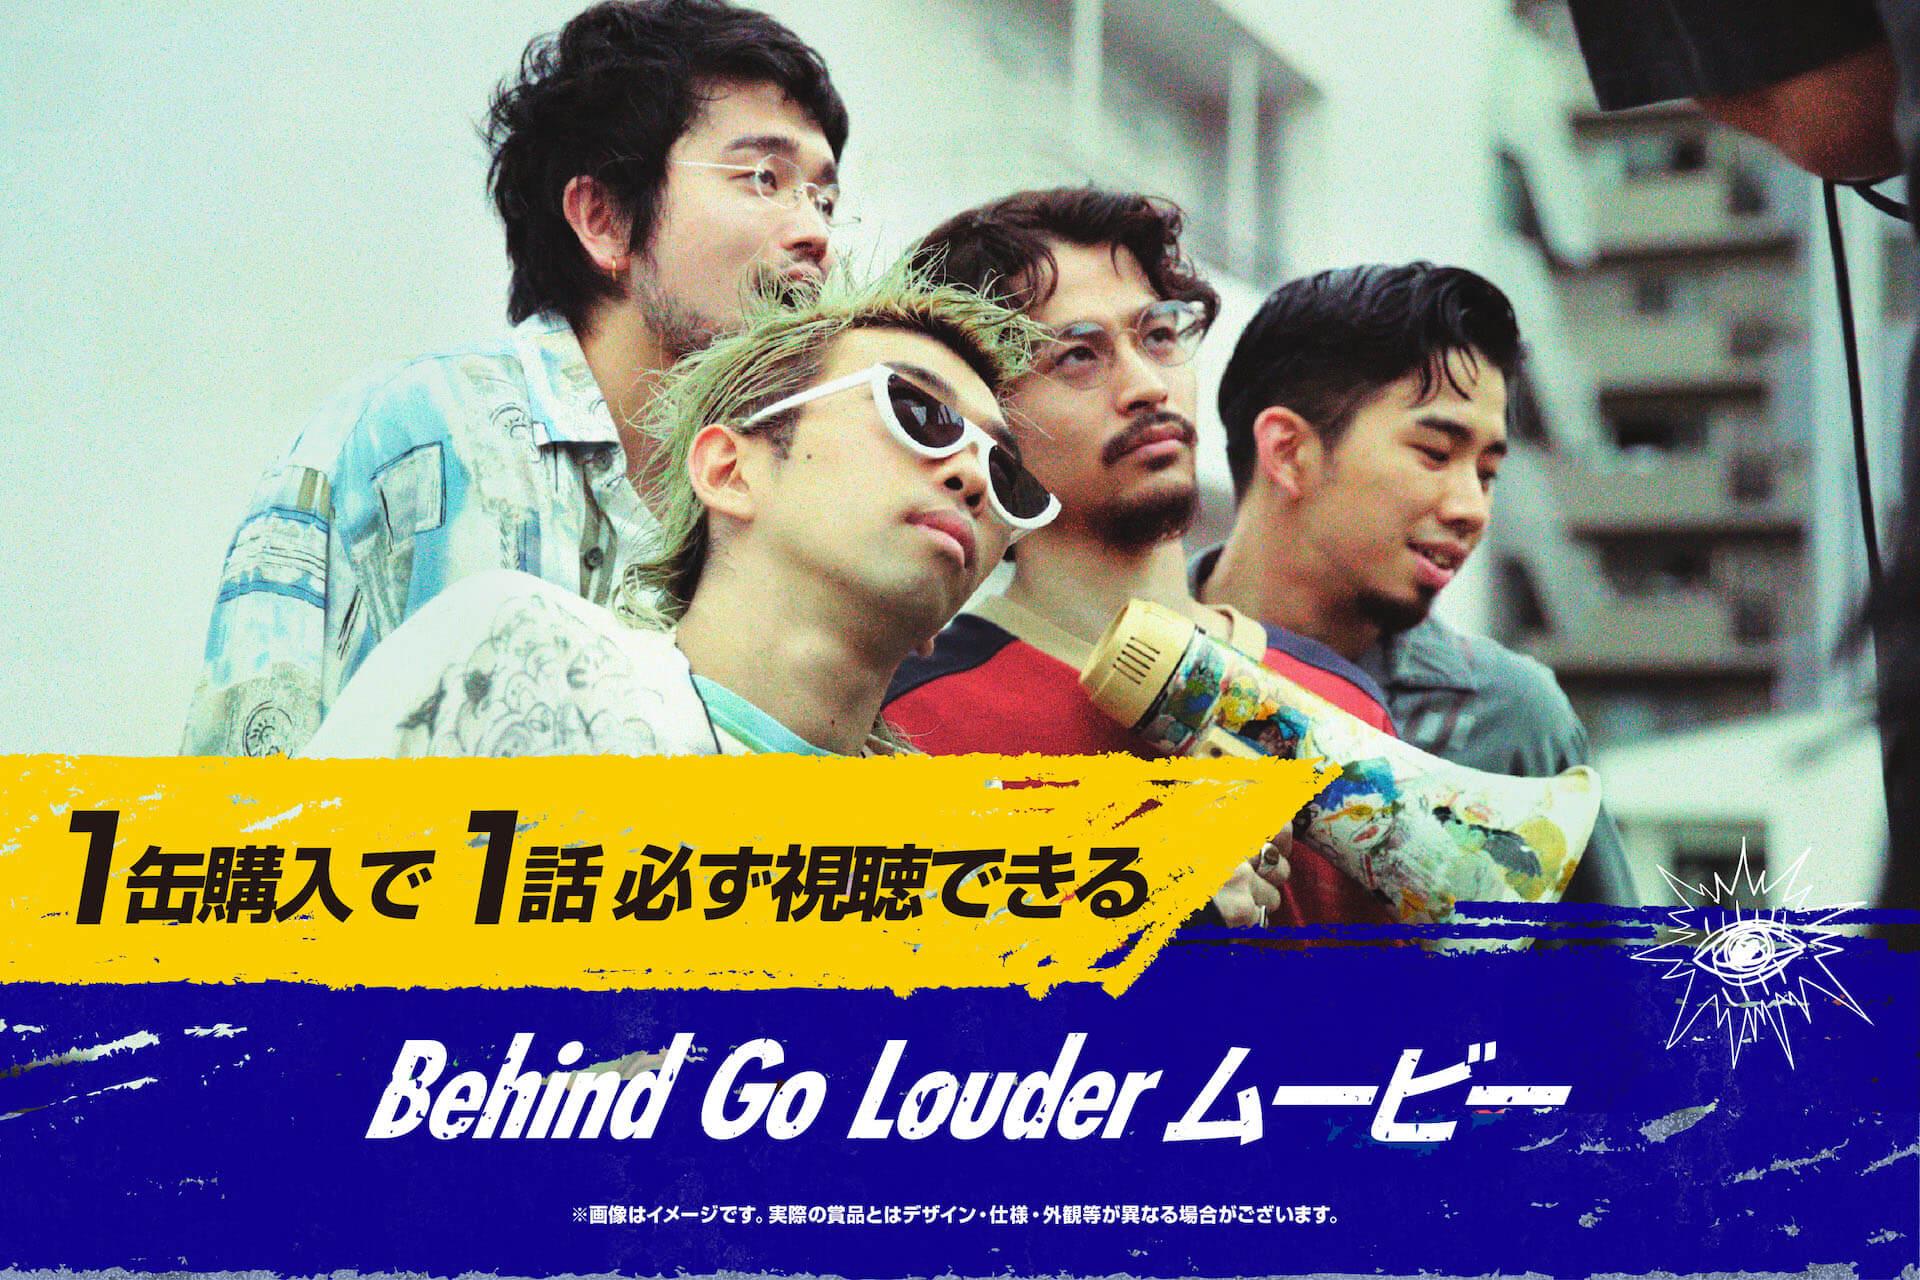 "King Gnuが日本アーティスト史上初めてRed Bullとパートナーシップを締結!""Go Louder""プロジェクトでインタビュー公開&コラボグッズプレゼントも music200908_kinggnu_redbull_8"